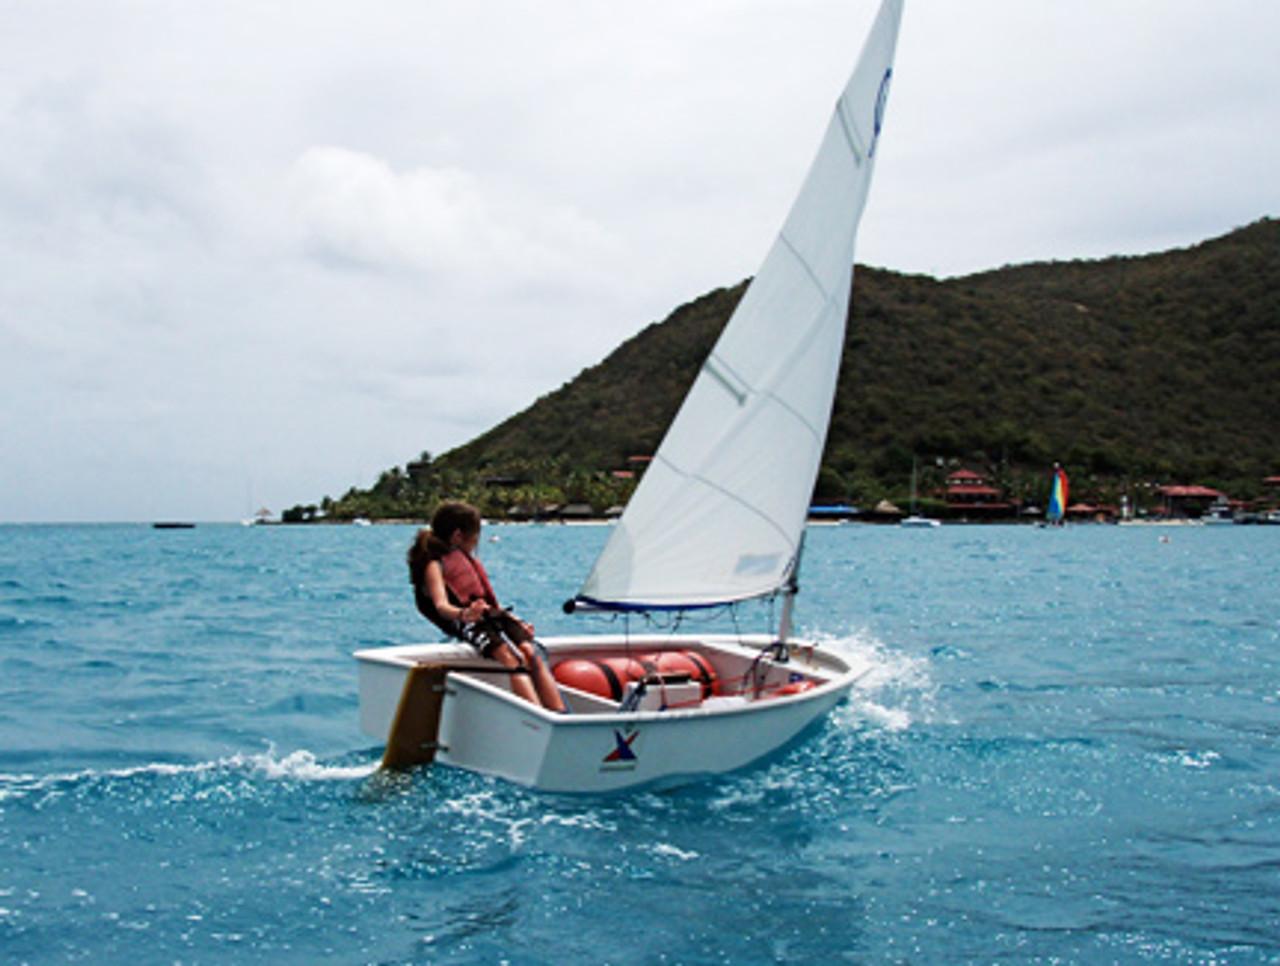 Optimist Replacement Sail